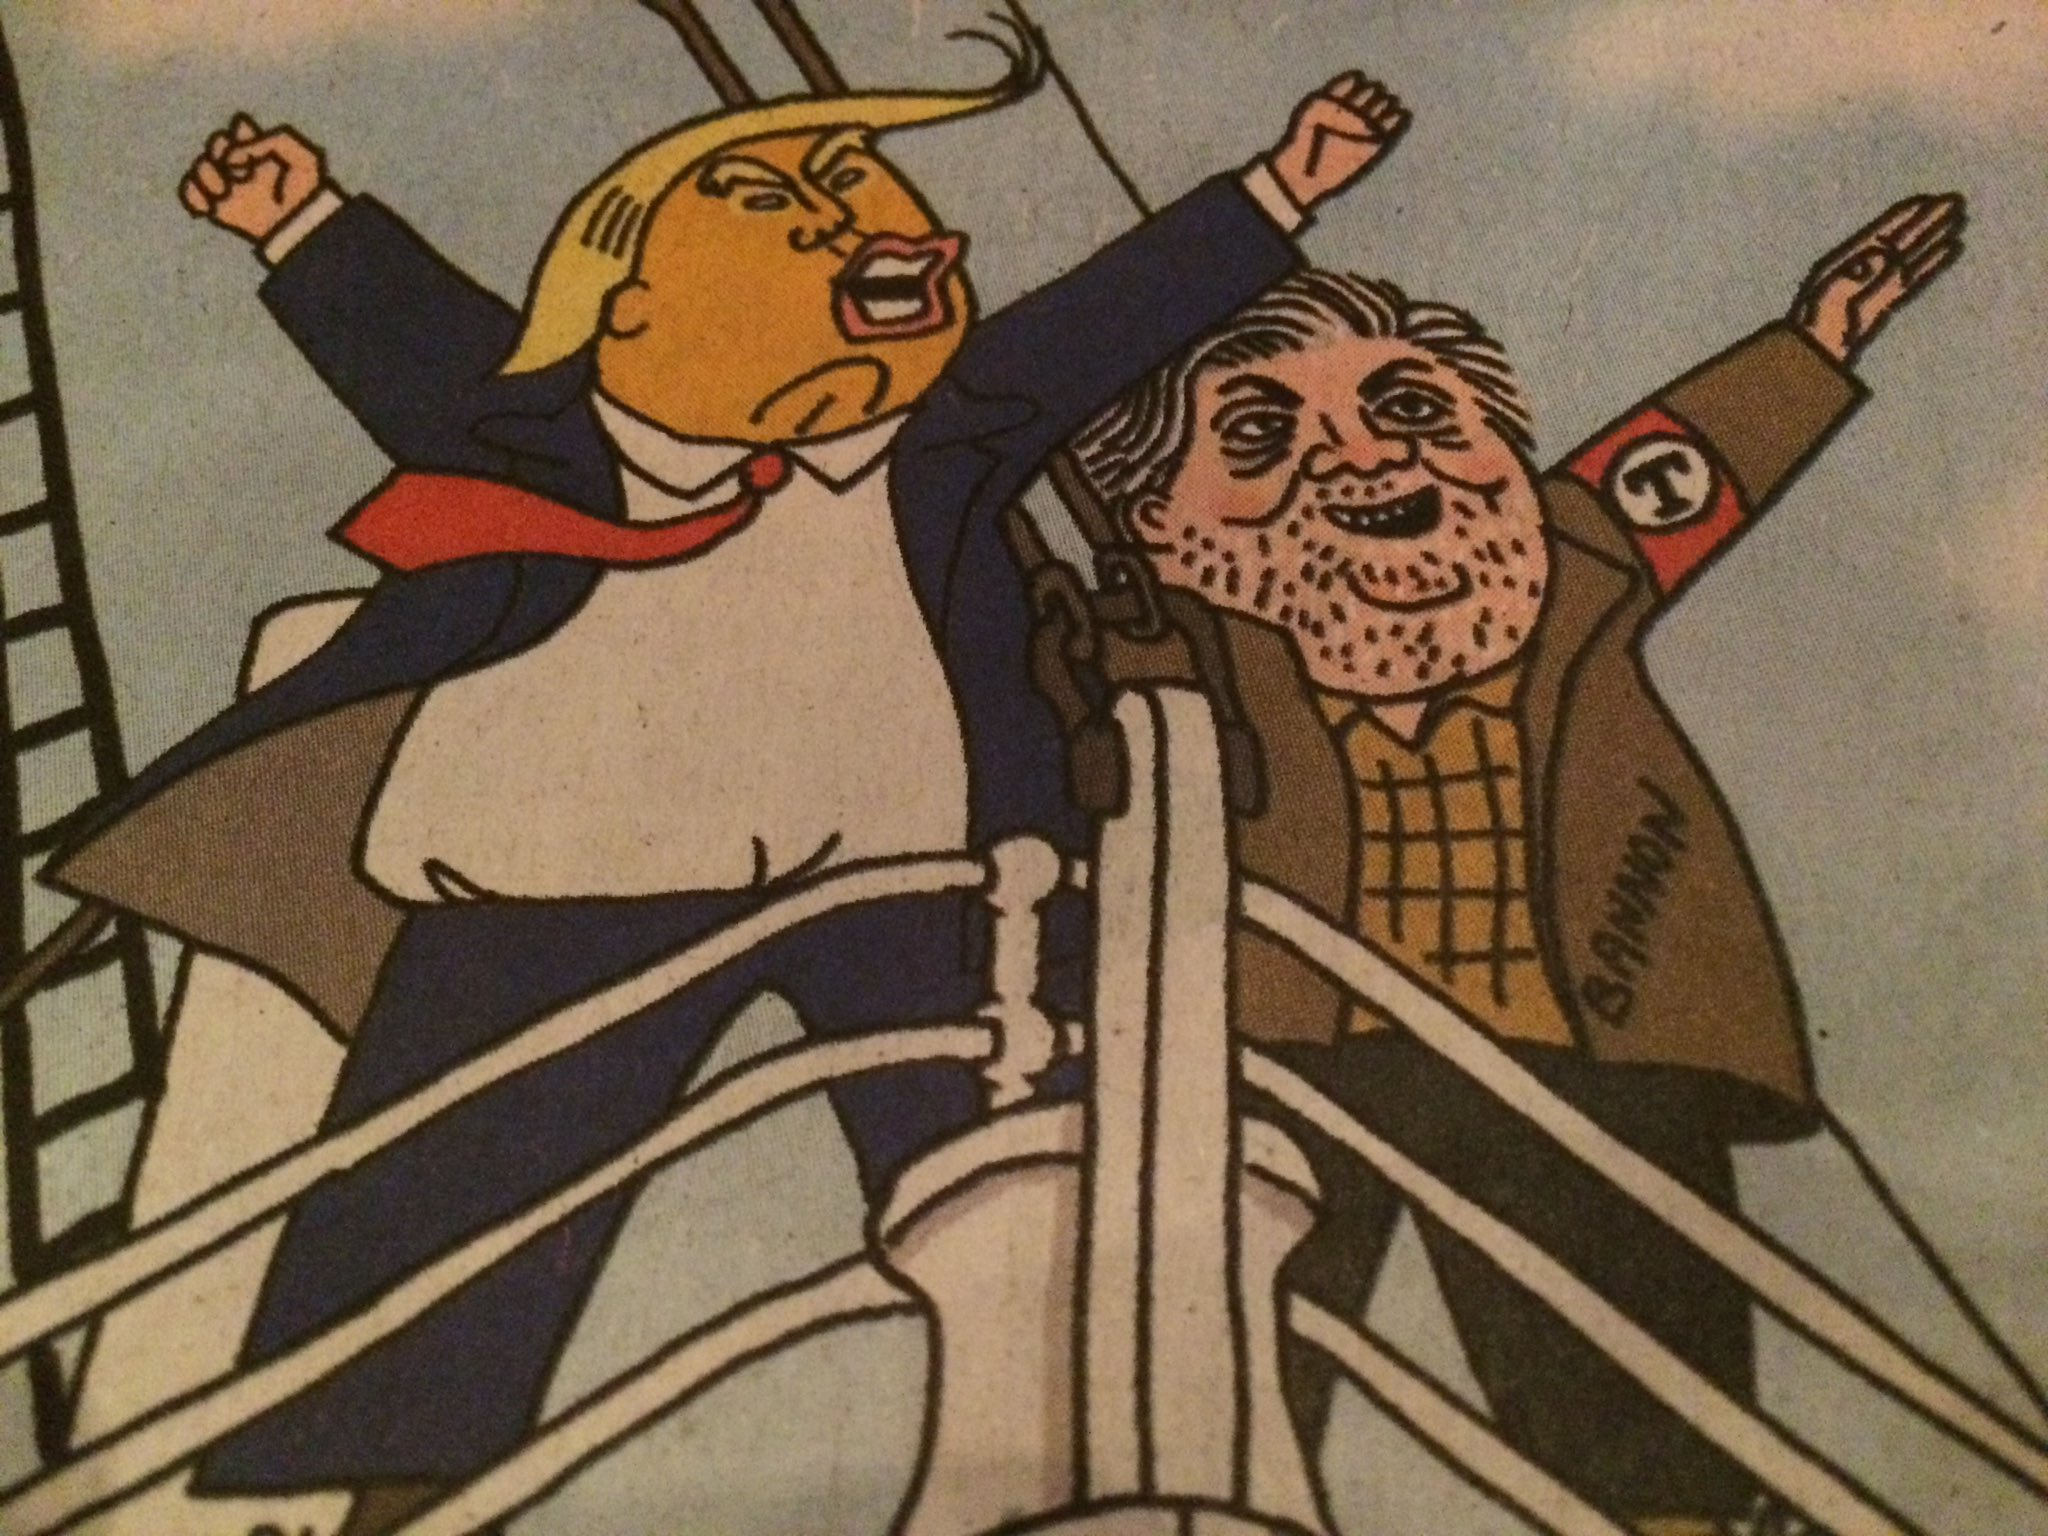 Trump-Bannon Titanic - Cartoon from China Daily